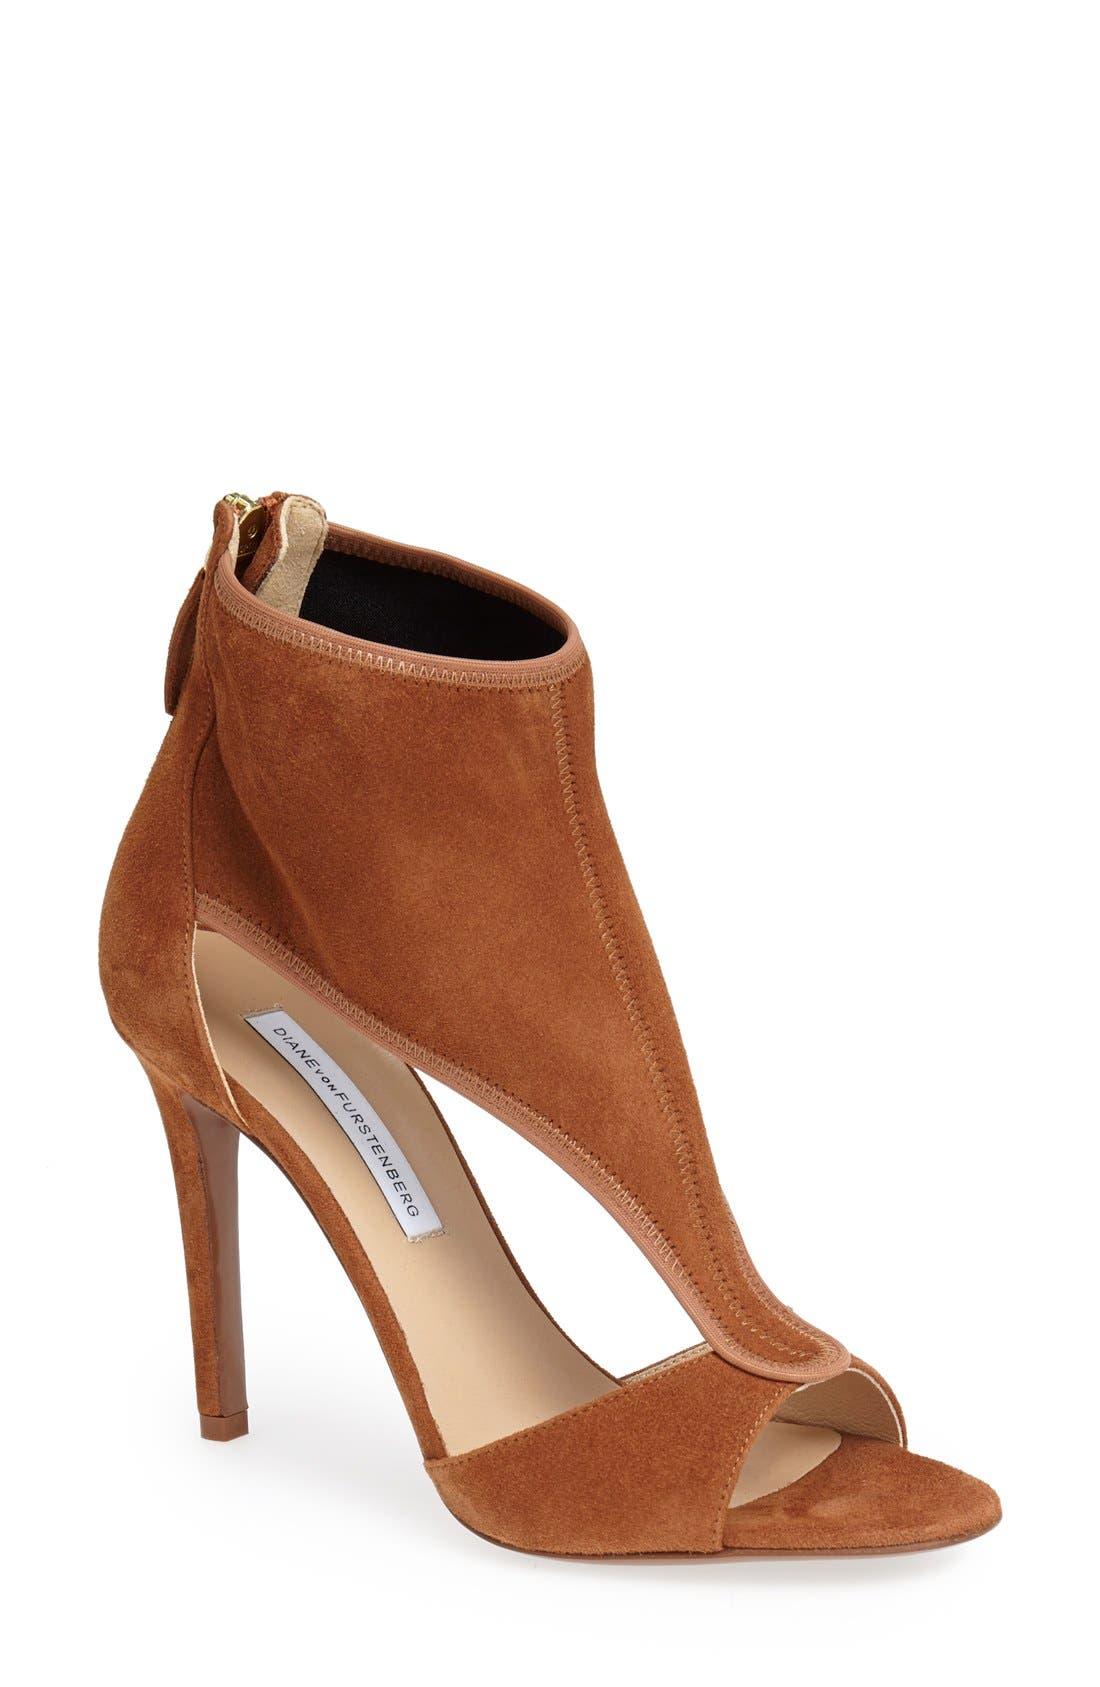 Alternate Image 1 Selected - Diane von Furstenberg 'Uffie' Sandal (Women)